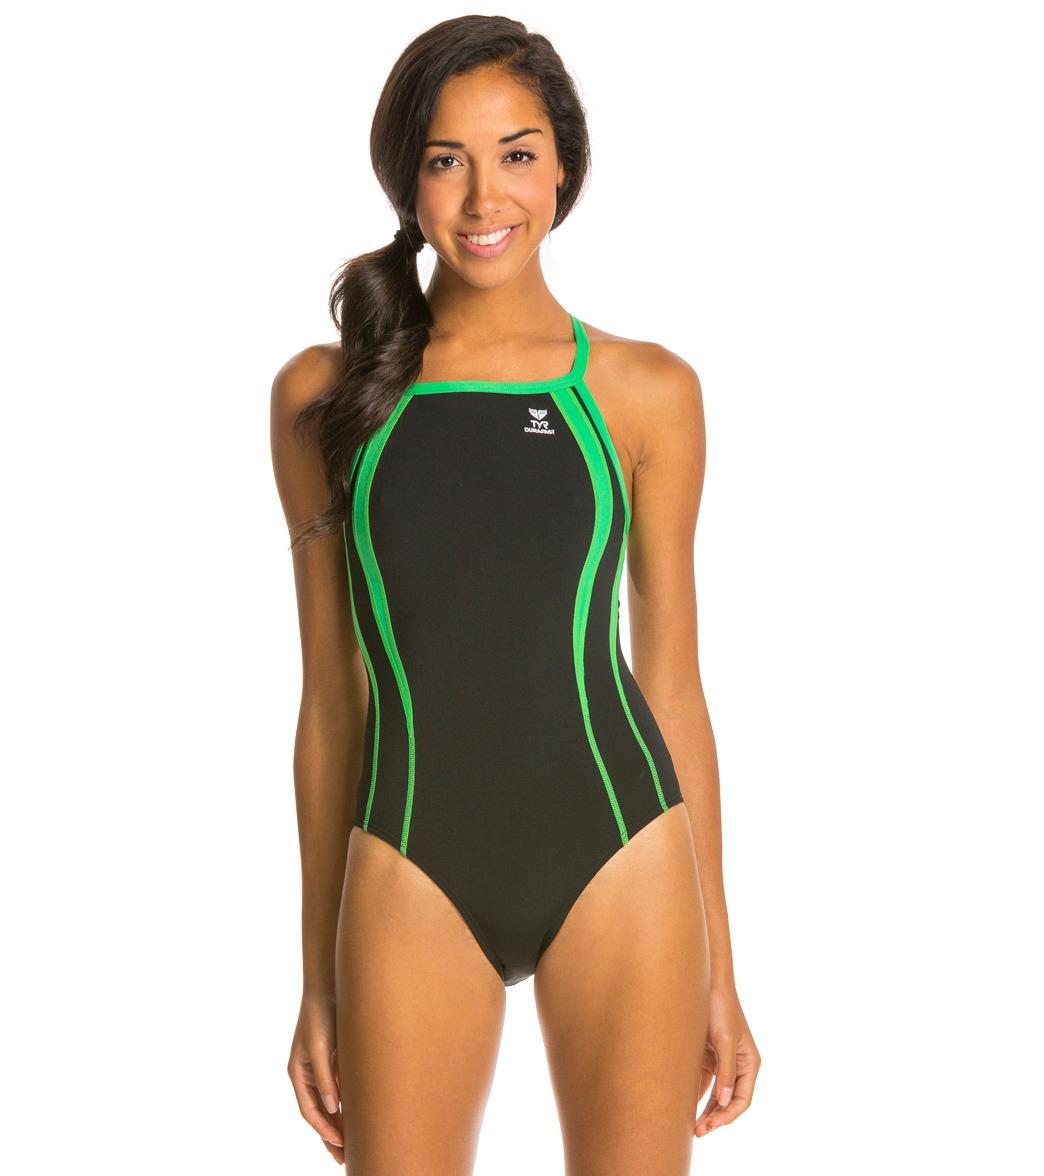 TYR Durafast Splice Diamondfit One Piece Swimsuit